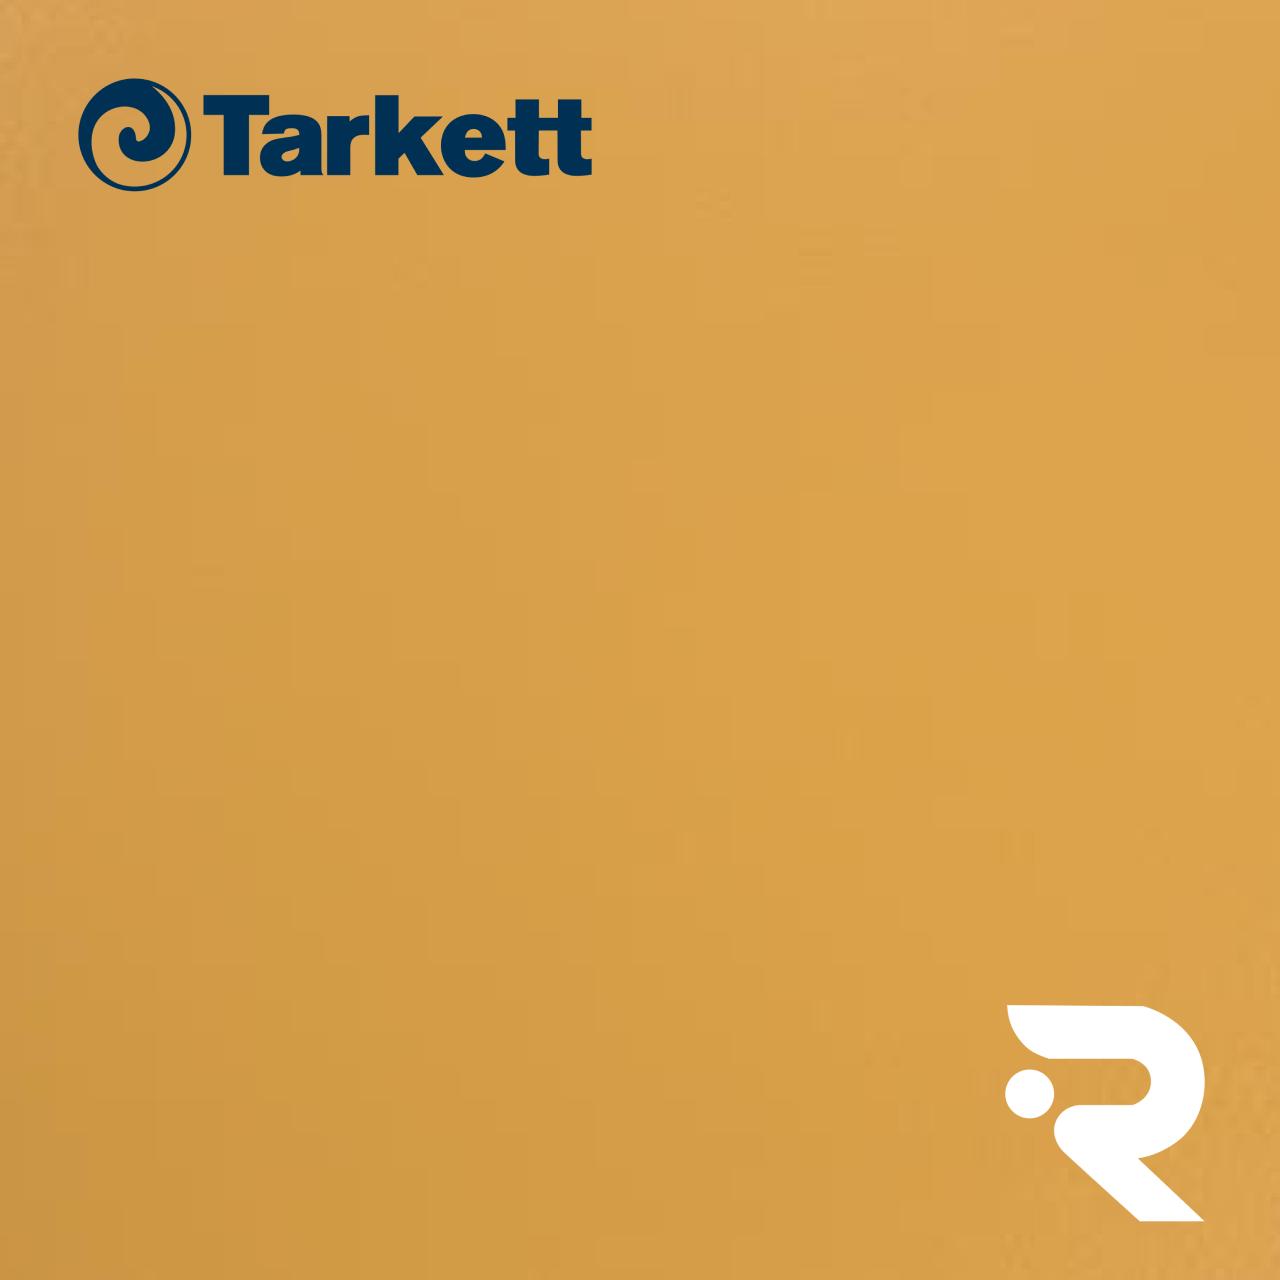 🏐 Спортивное покрытие Tarkett | YELLOW | OMNISPORTS V35 | 2 х 20.5 м